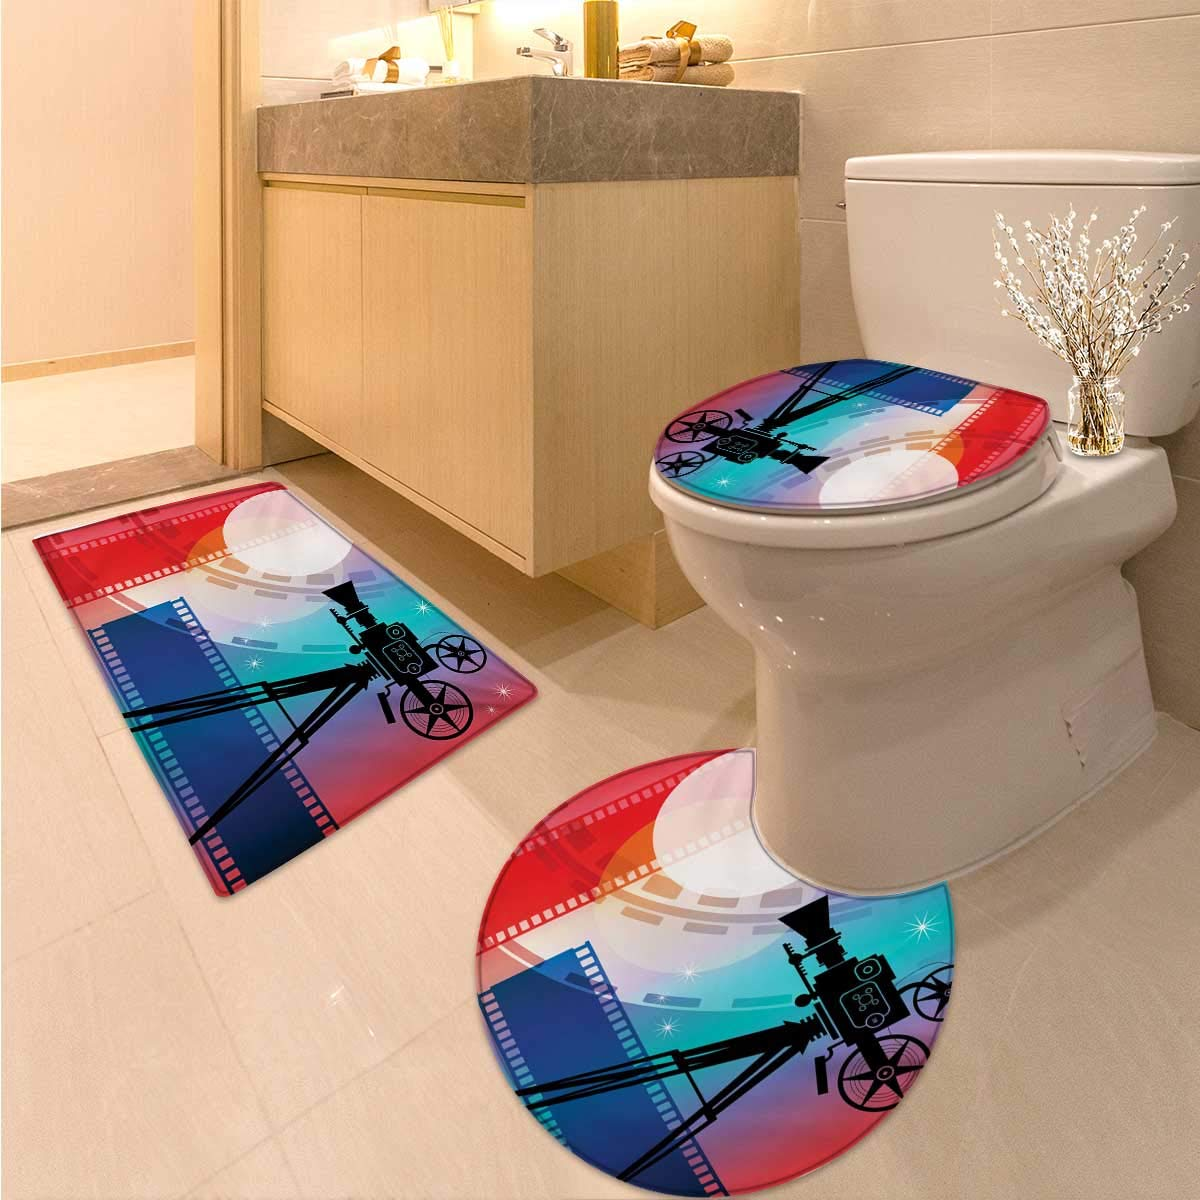 Anhuthree Cinema Toilet Carpet Floor mat Set Colorful Projector Silhouette with Movie Reel Vintage Design Entertainment Theme Bath Rug Set Multicolor